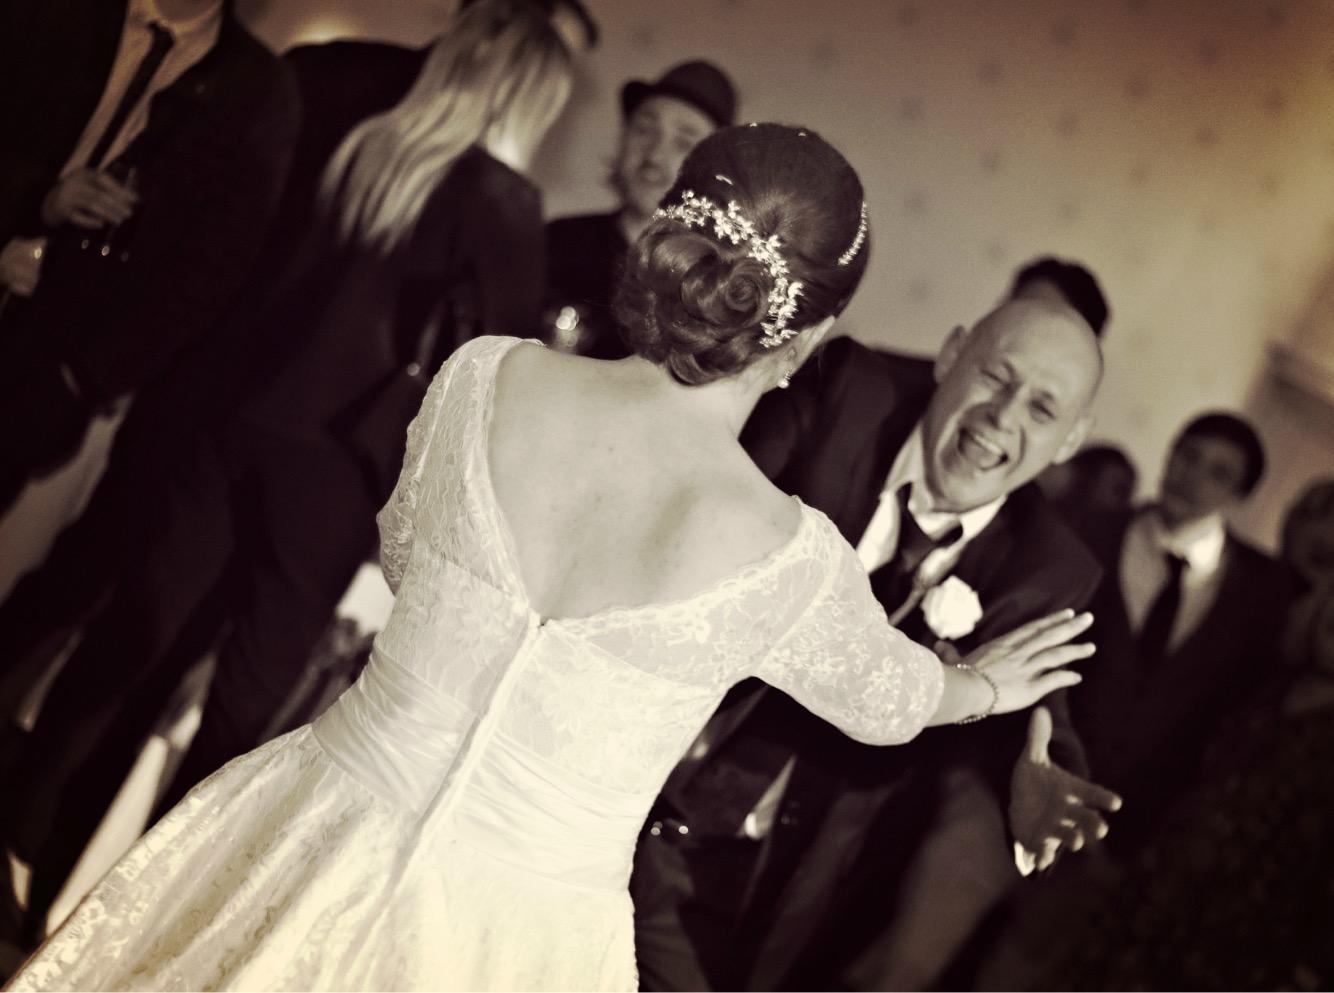 Charmaine's wedding